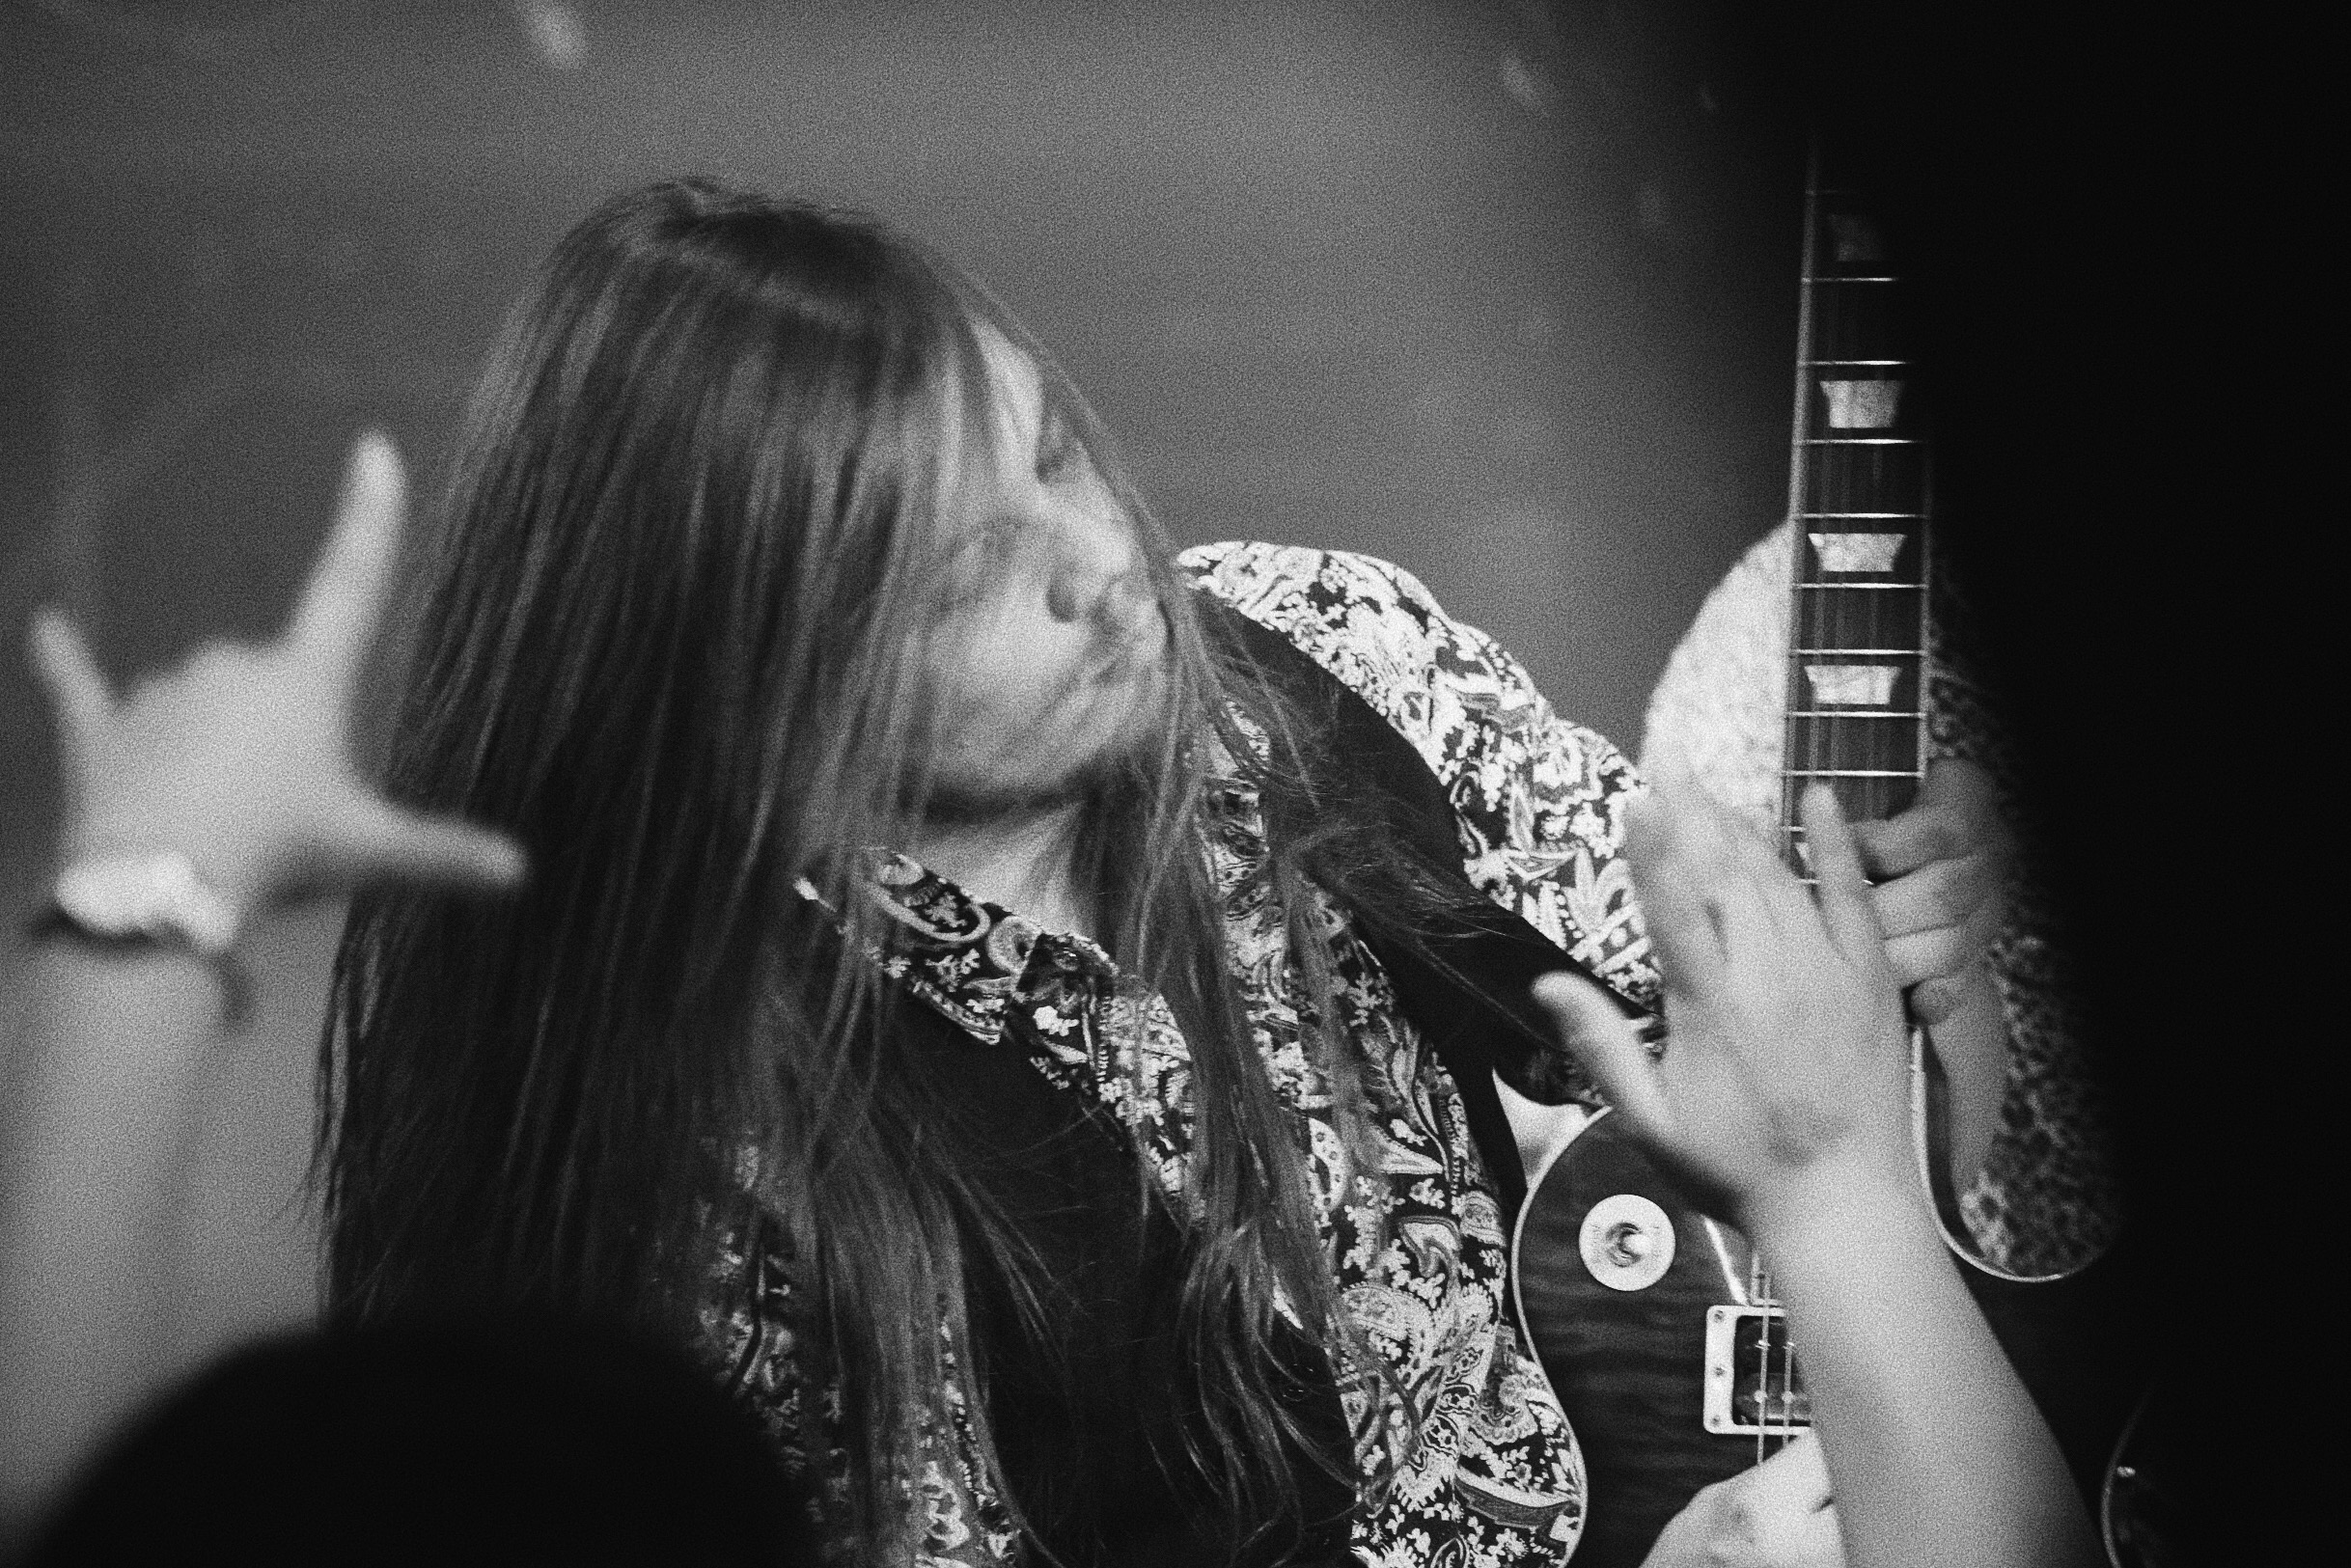 HUNTER Lovan — Lead Guitar